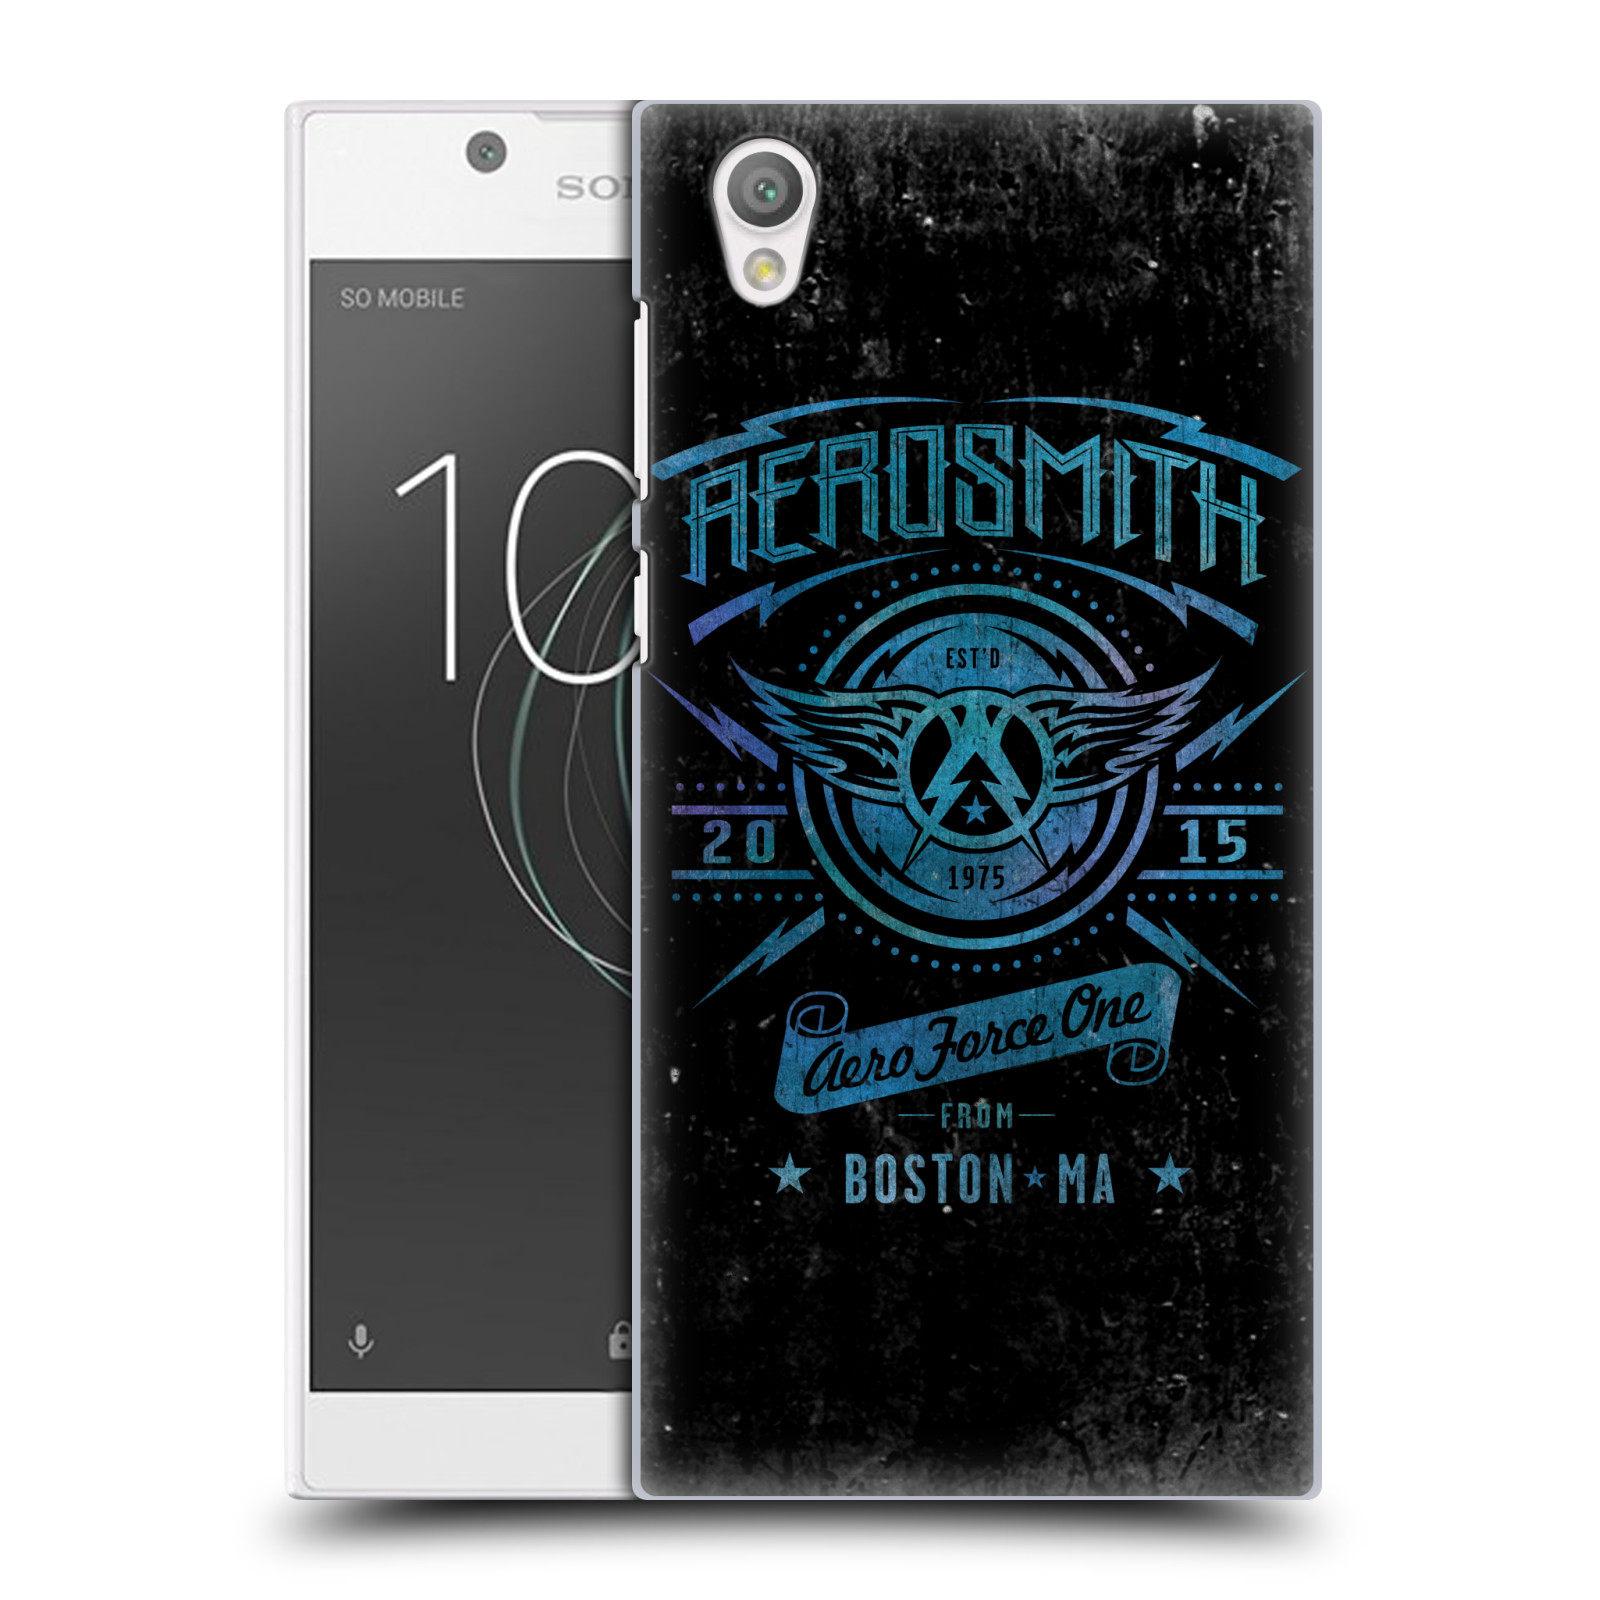 Plastové pouzdro na mobil Sony Xperia L1 - Head Case - Aerosmith - Aero Force One